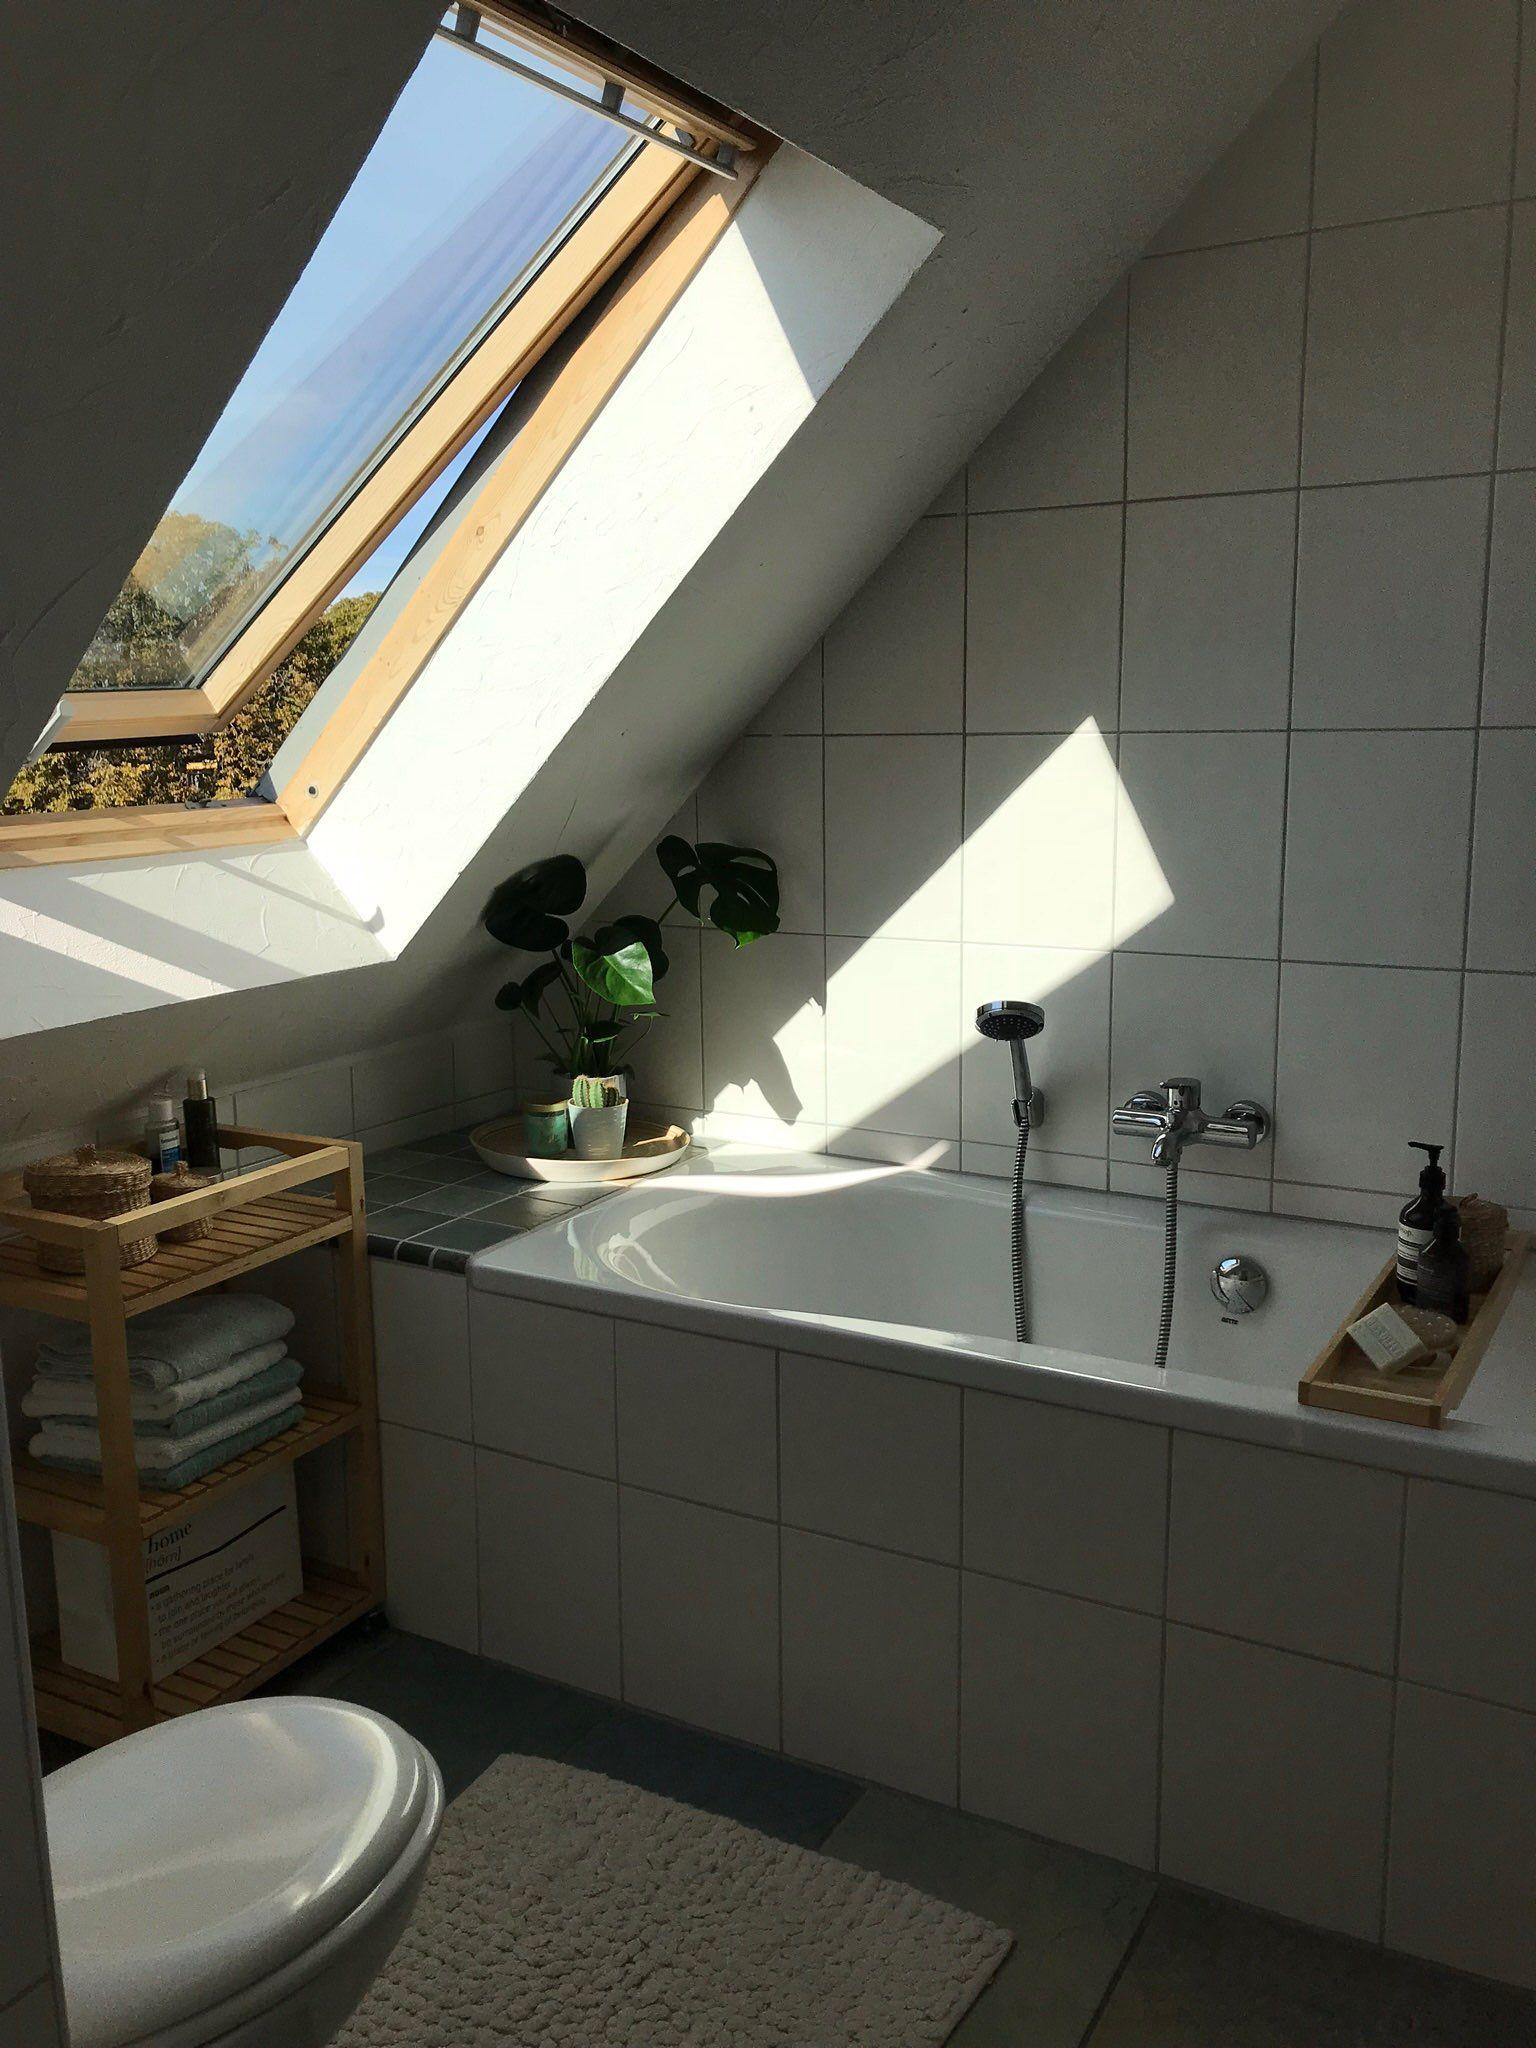 Schones Badezimmer In Dachgeschosswohnung Schone Badezimmer Wohnung Dachgeschosswohnung